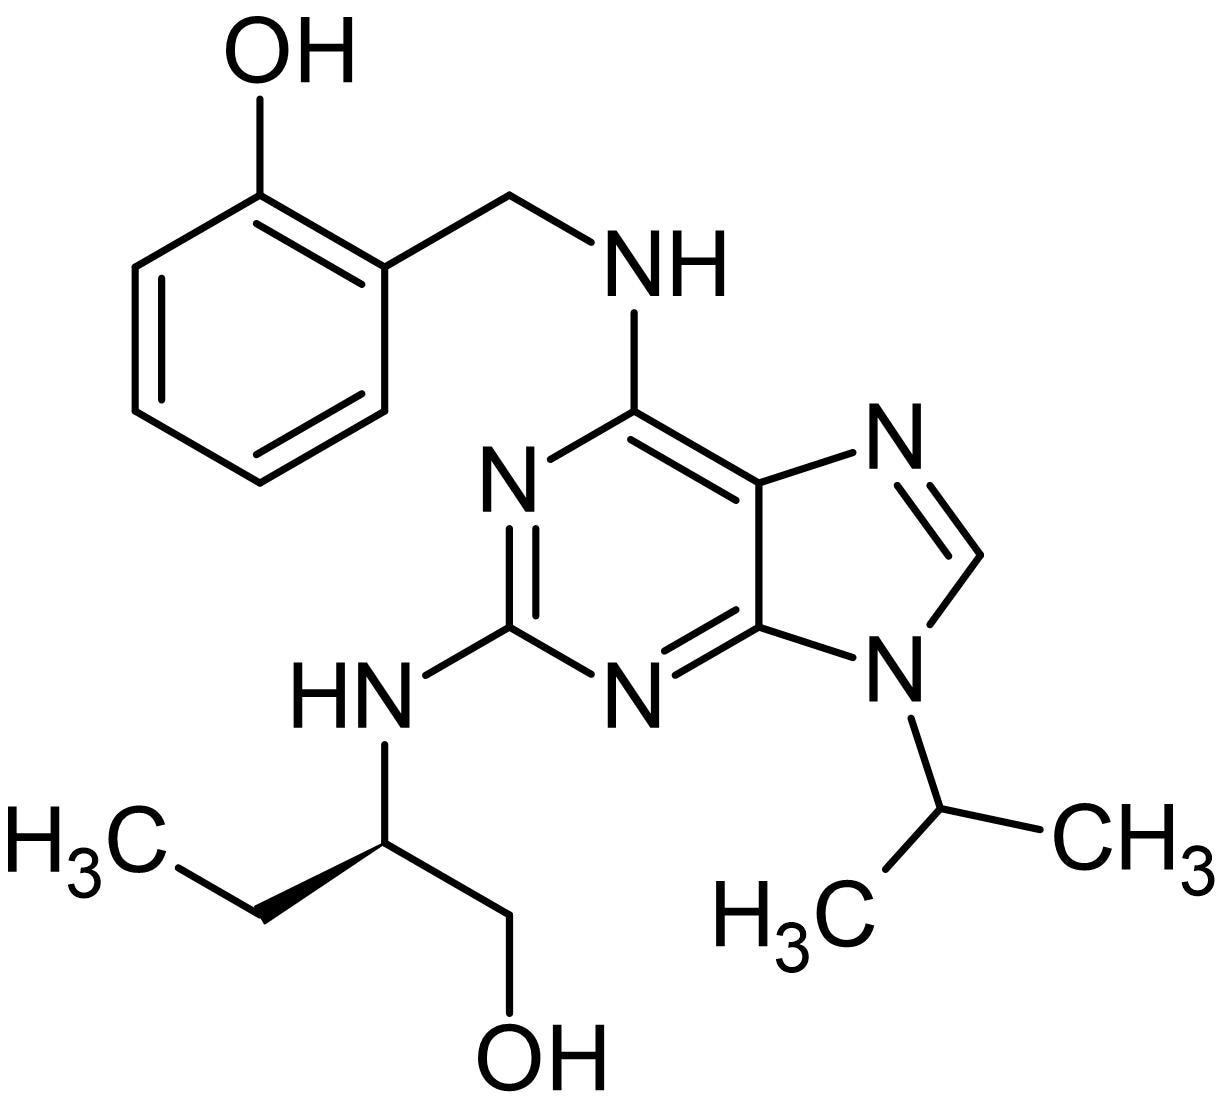 Chemical Structure - Olomoucine II, CDK/cyclin inhibitor (ab141238)